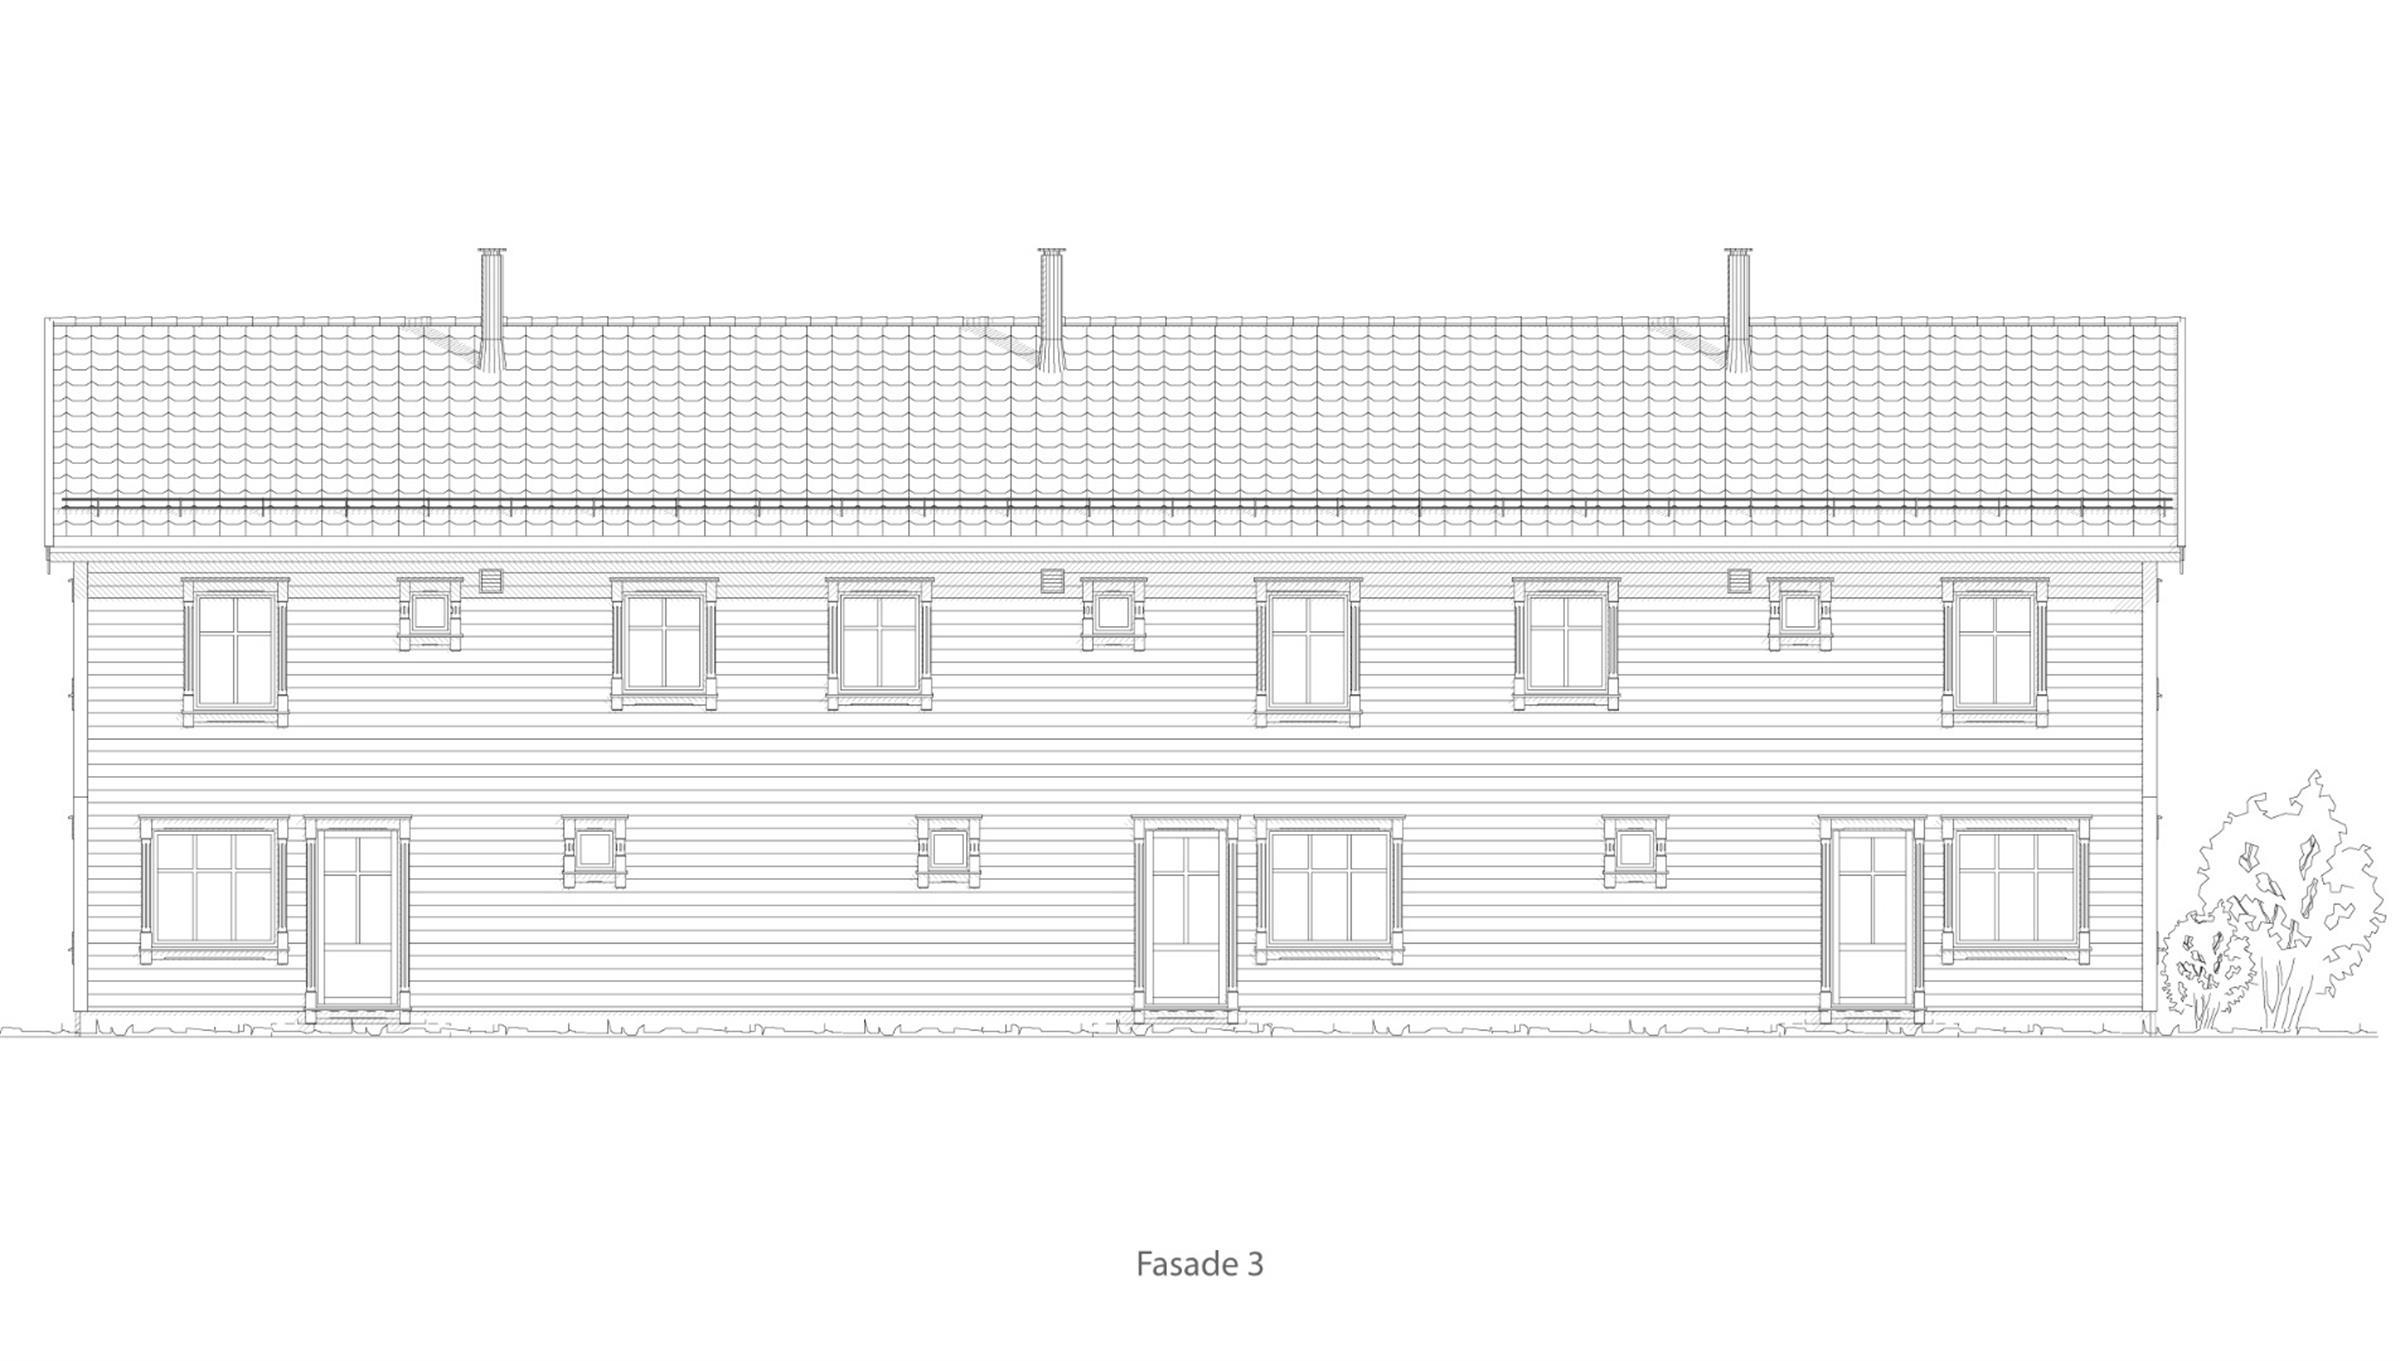 Hamar fasade 3